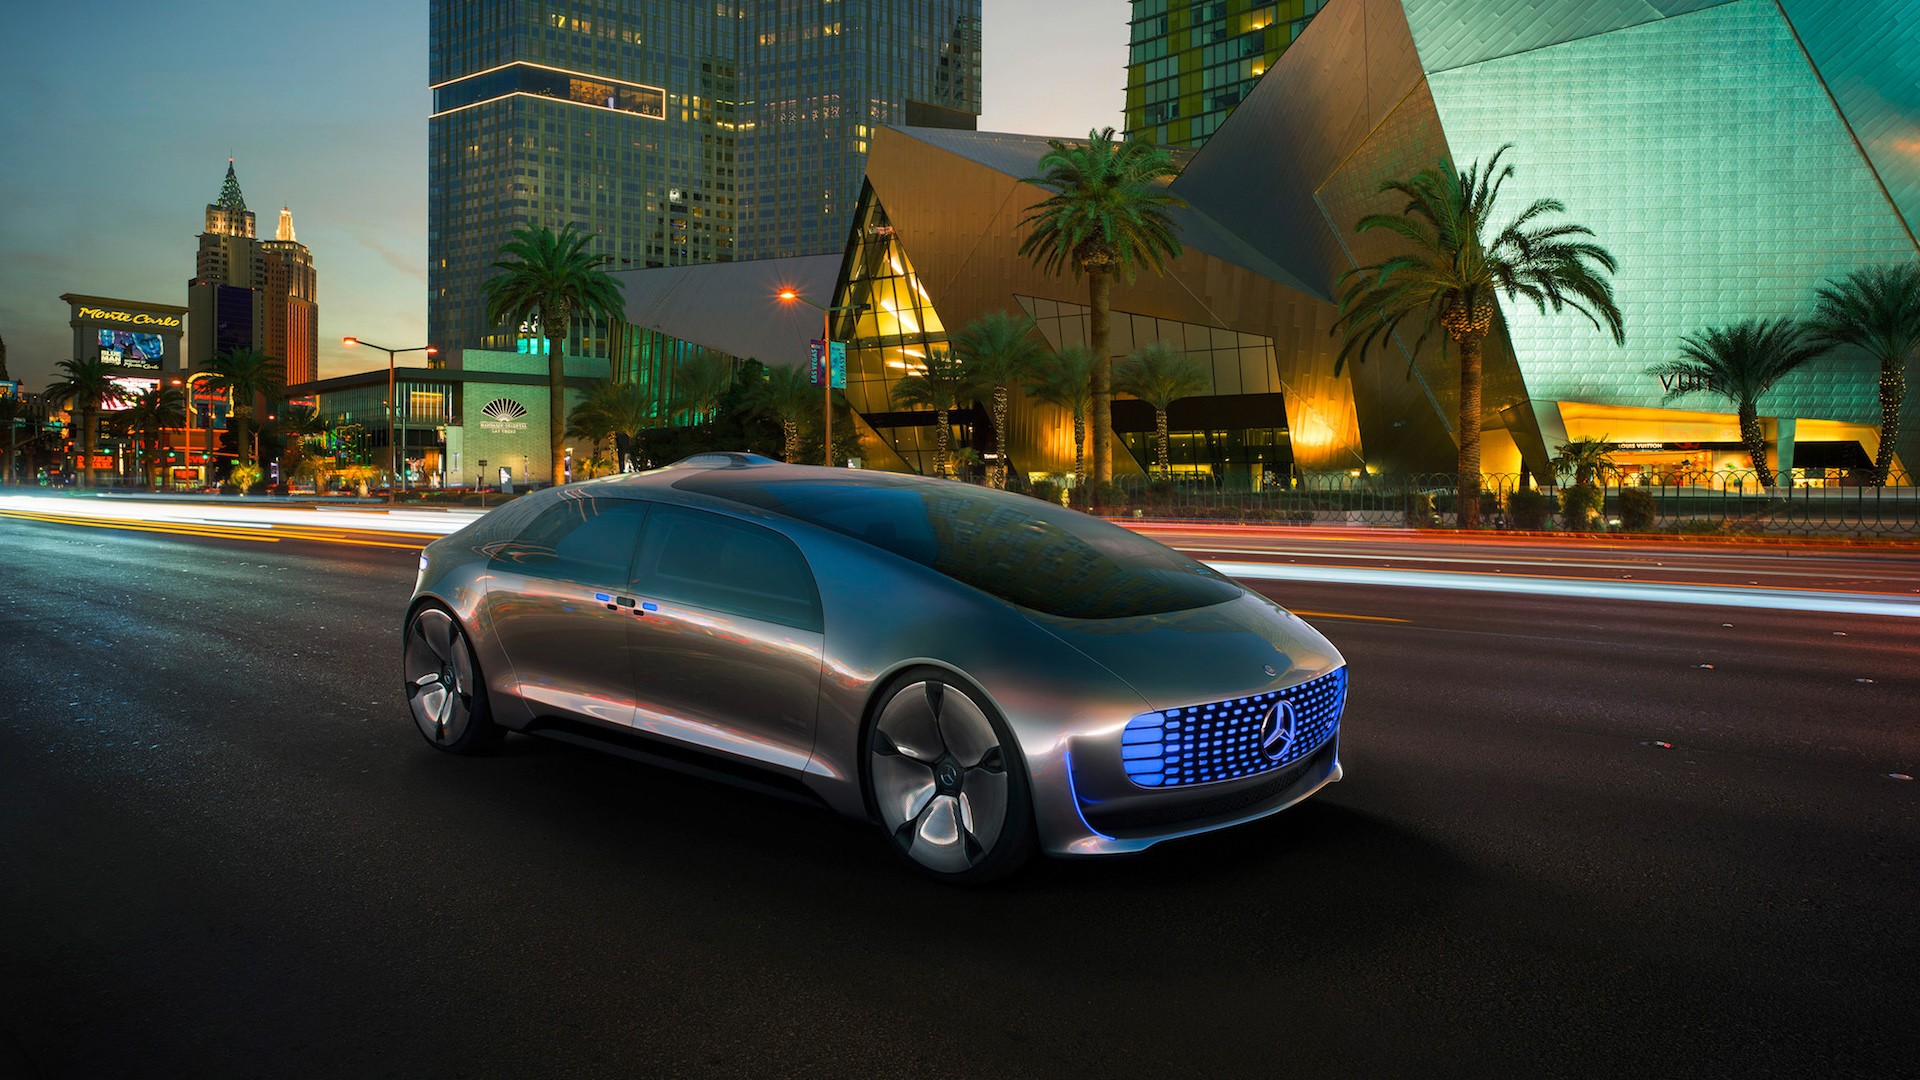 2015 mercedes benz f 015 luxury wallpaper hd car - Luxury car hd wallpaper download ...